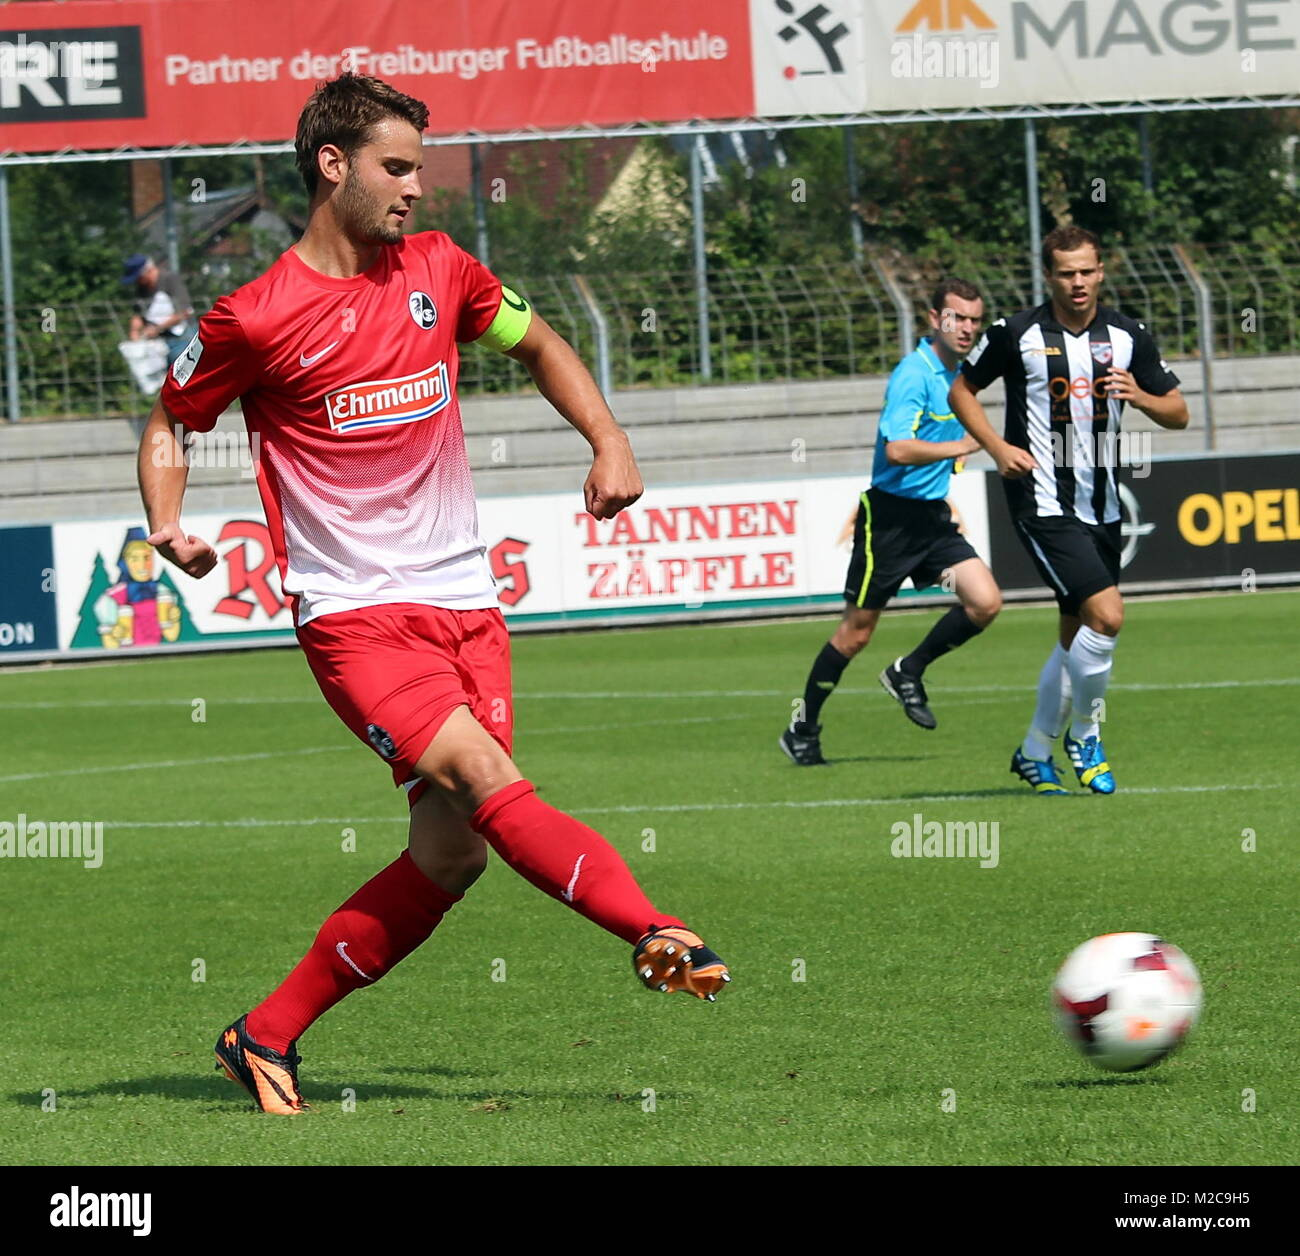 SC-Kaptiän Tim Albutat am Ball - Fußball-Regionalliga Südwest: SC Freiburg II - KSV Baunatal Stock Photo